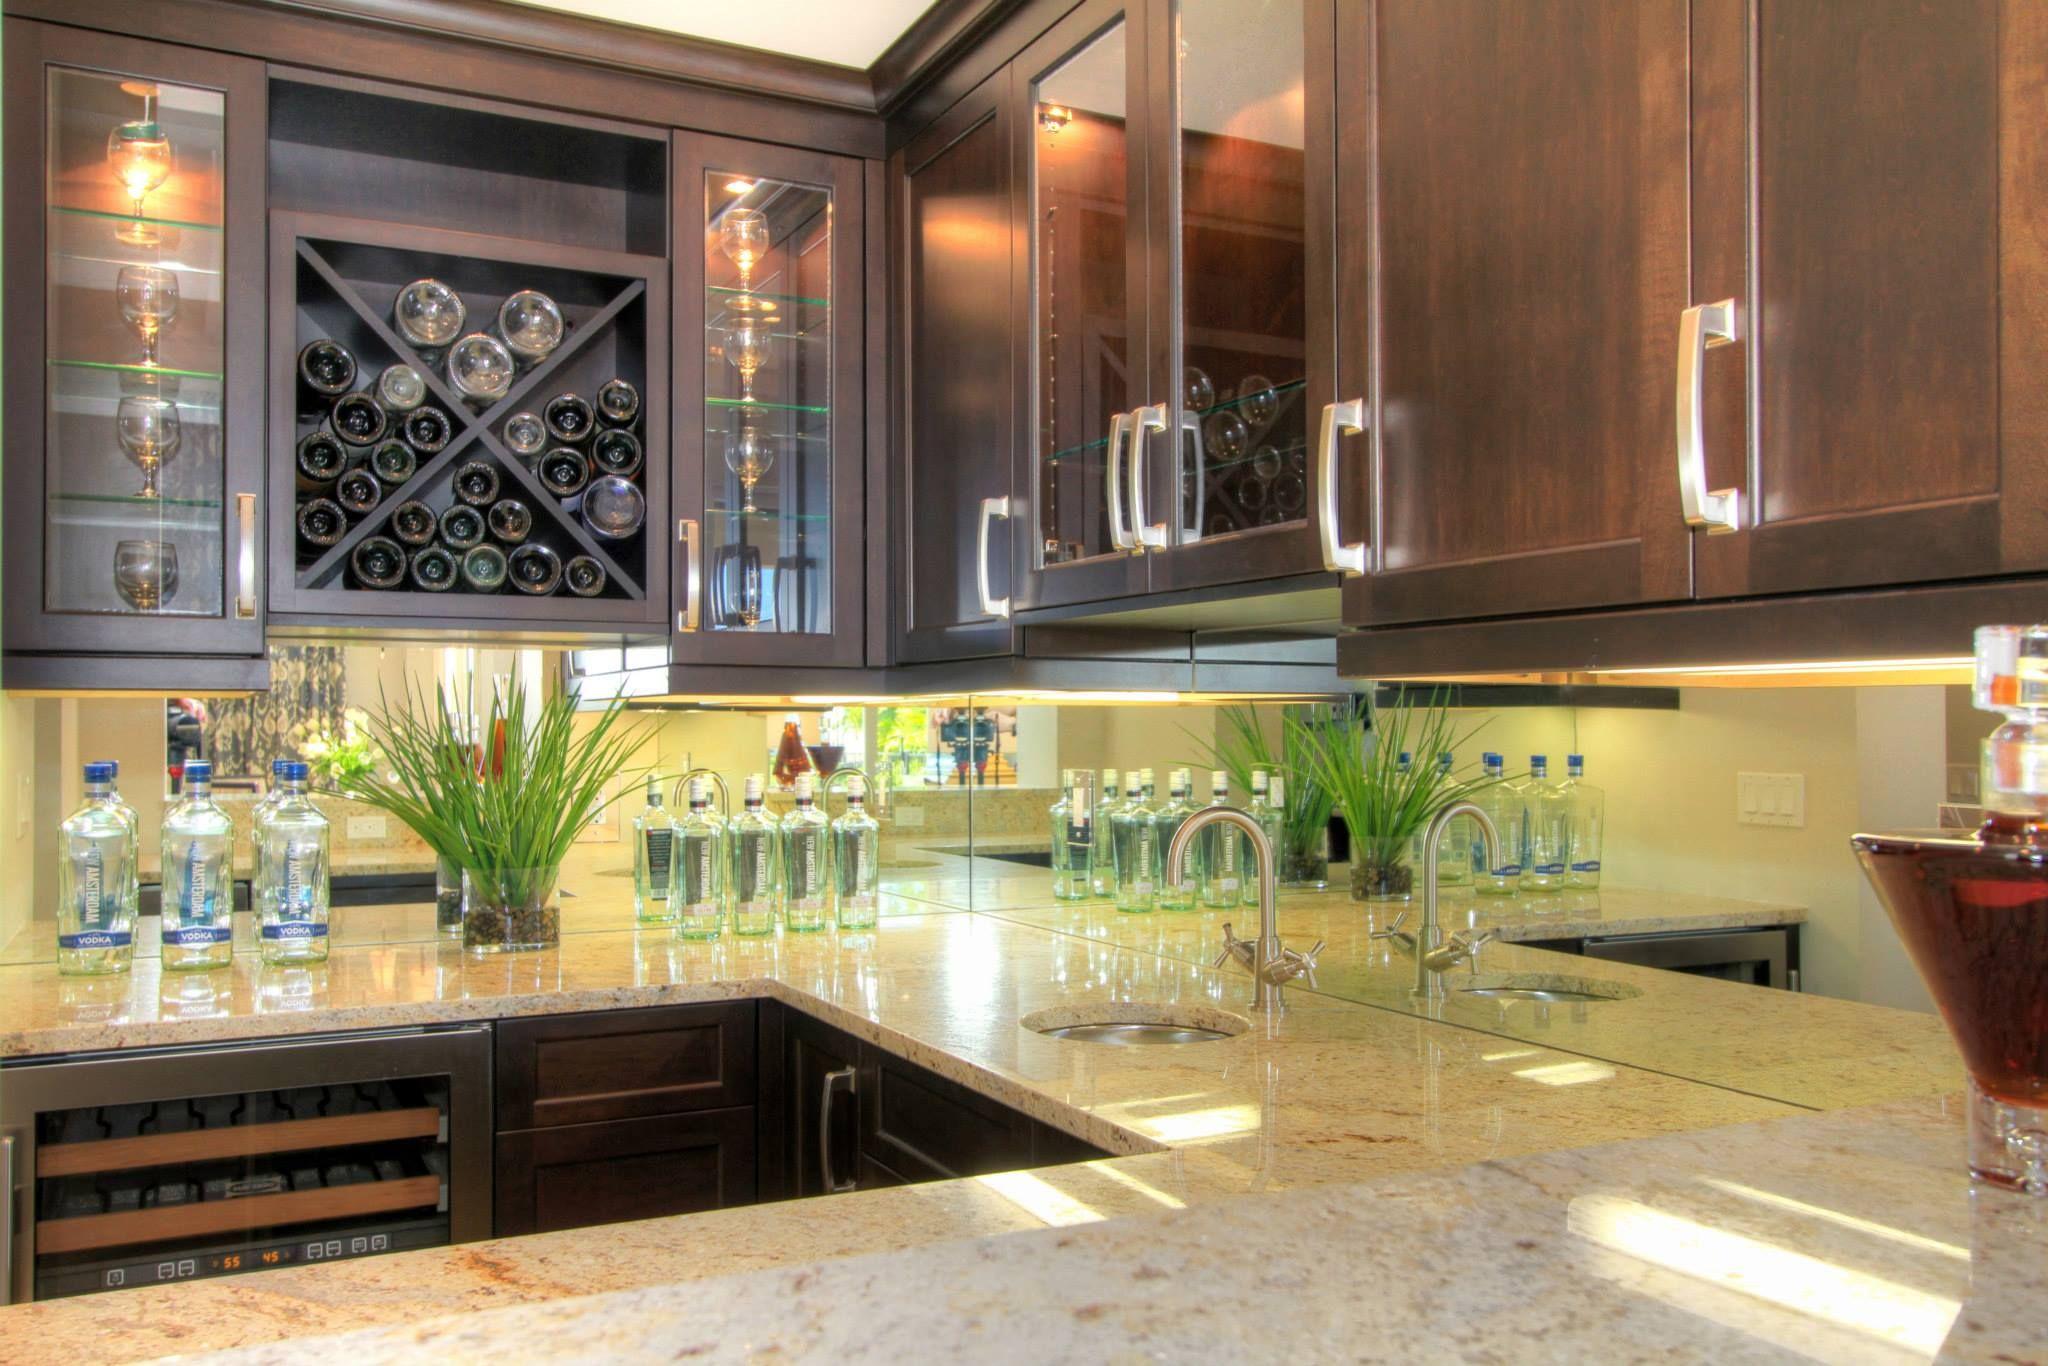 Mirror Glass Backsplash Ideas For Your Kitchen We Also Do